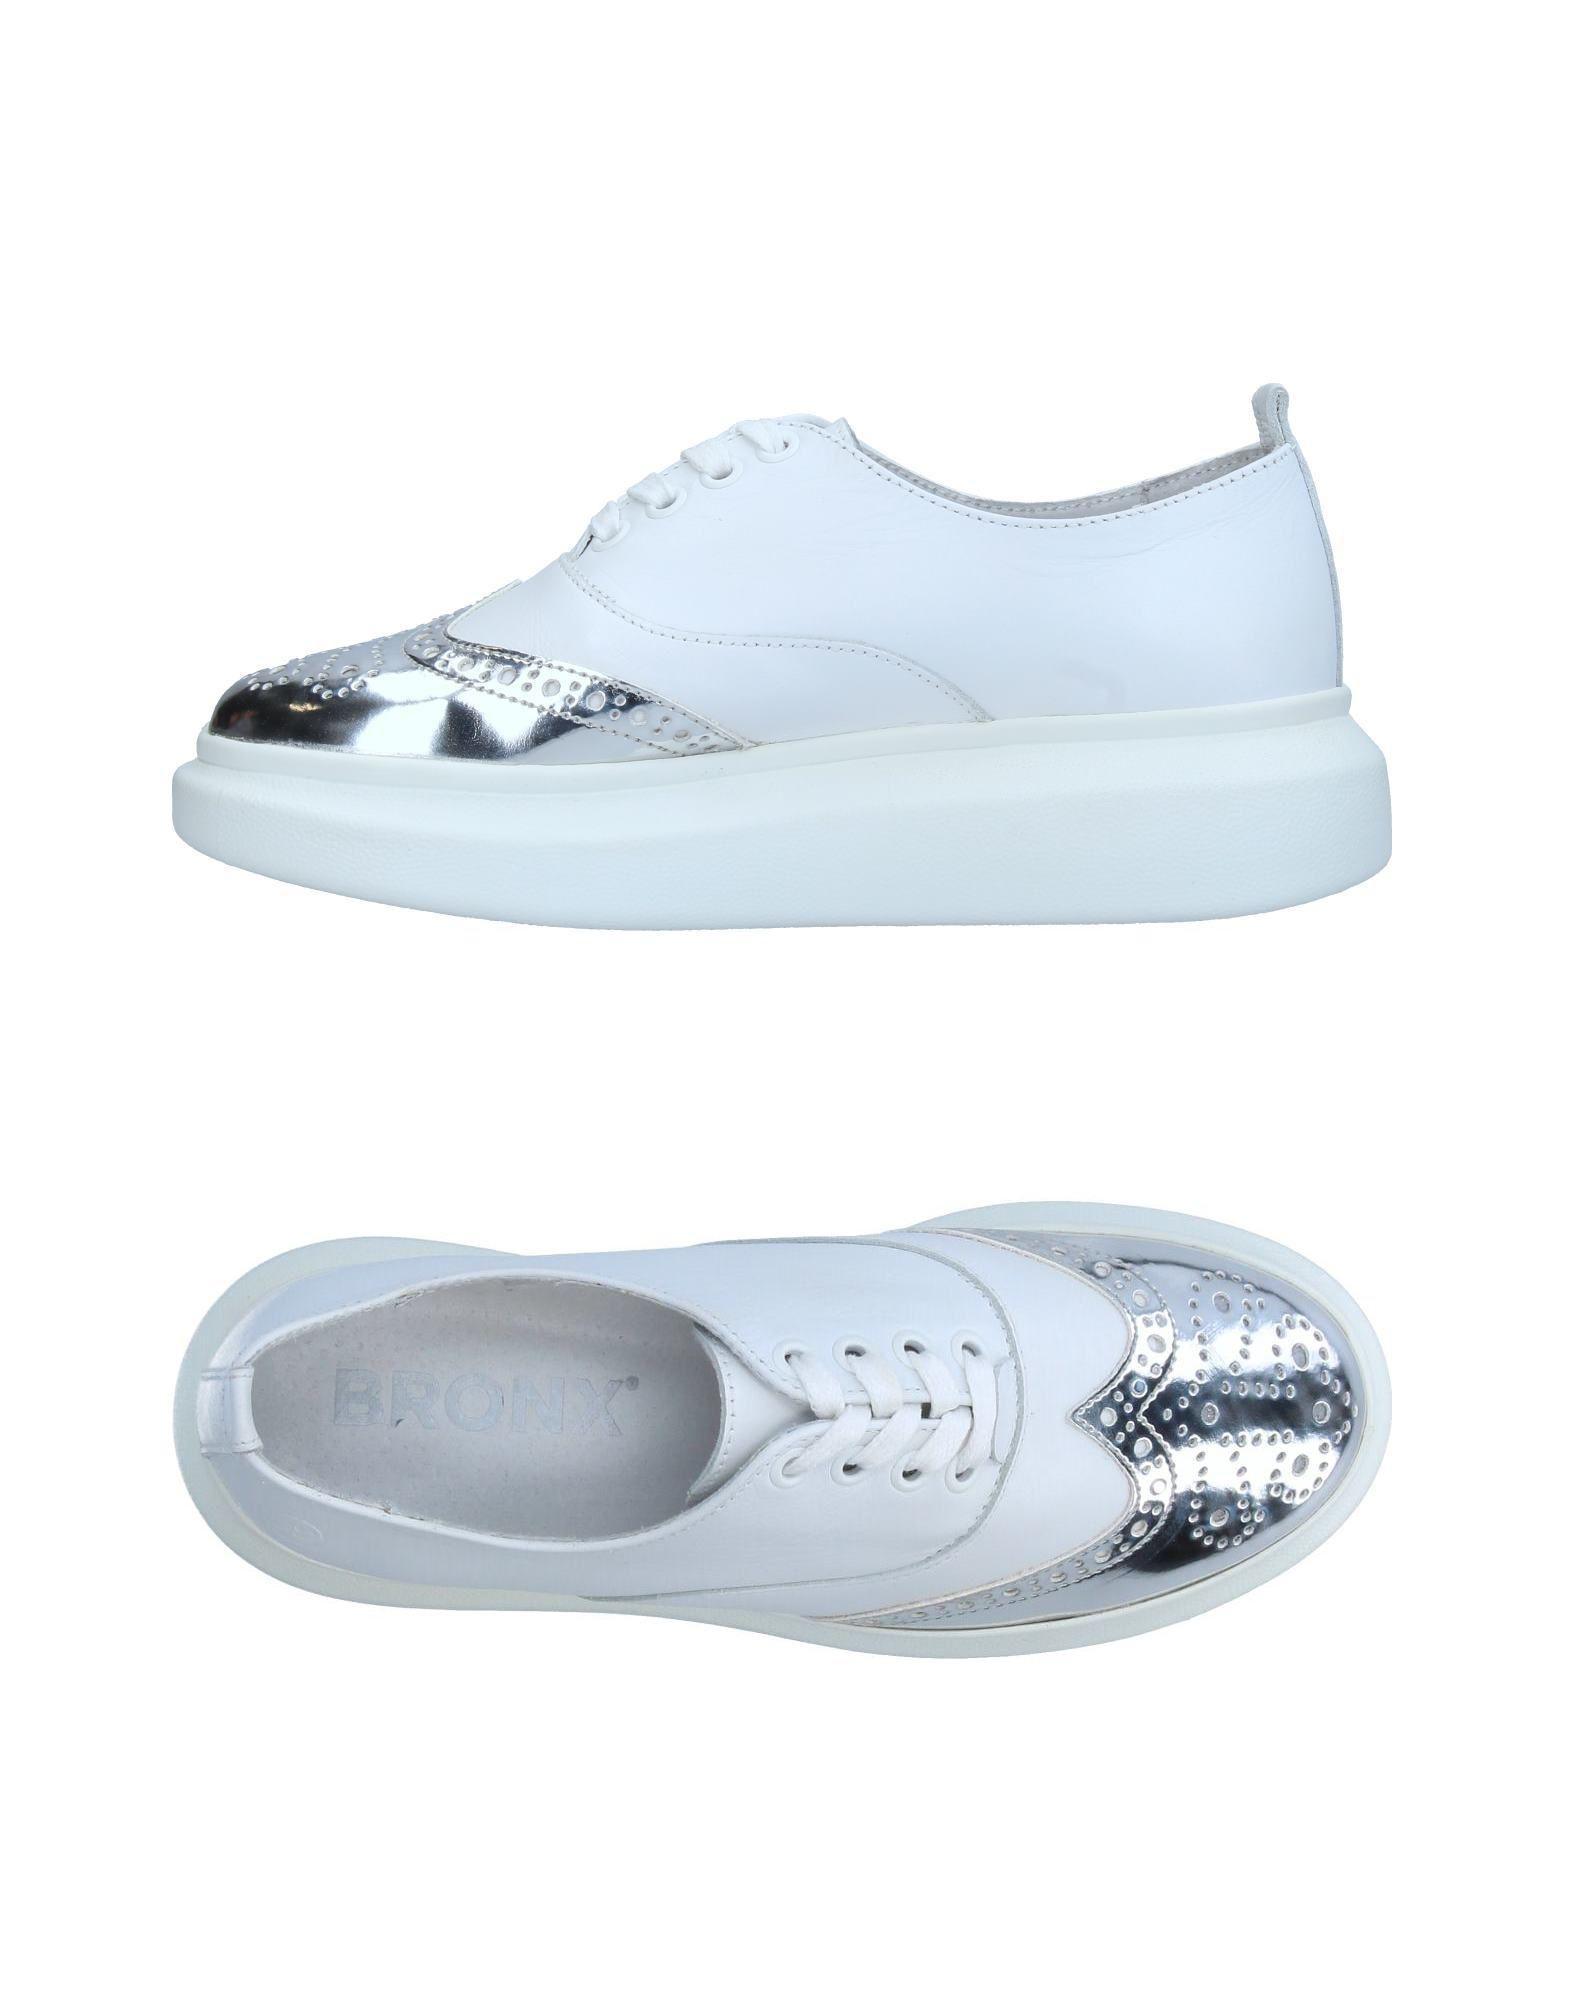 FOOTWEAR - Low-tops & sneakers Bronx 4chXi0GzK